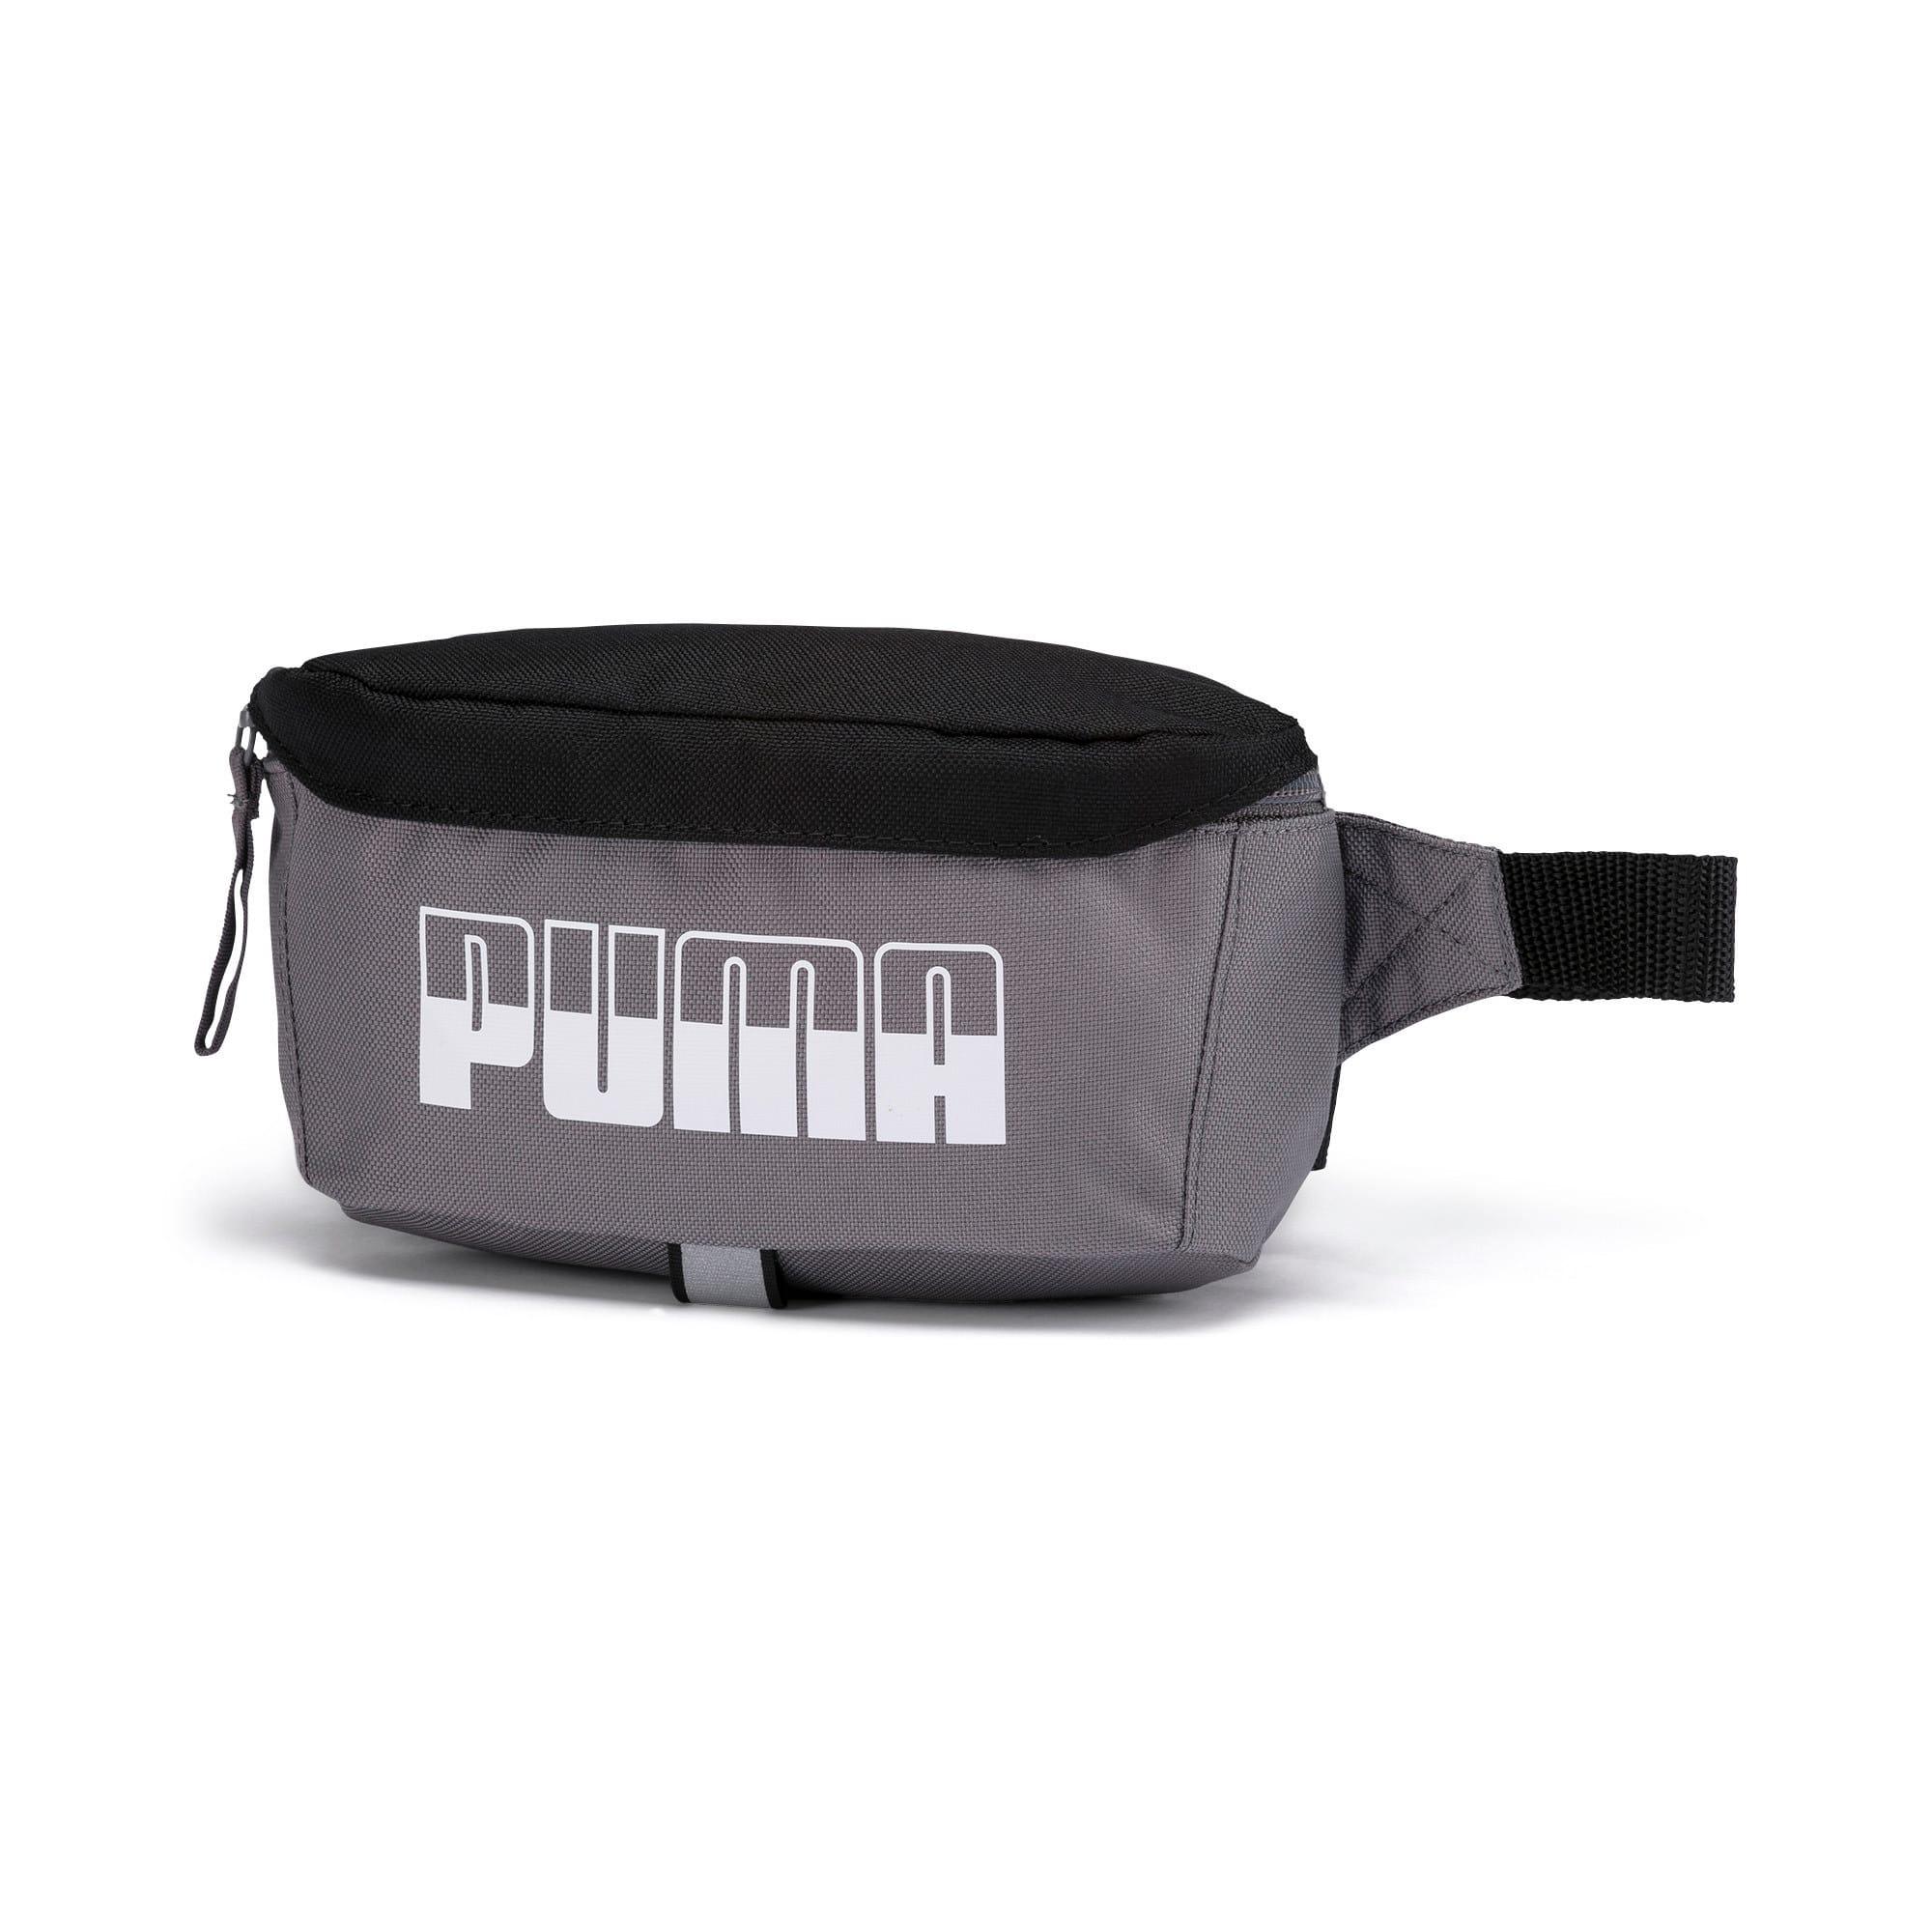 Miniatura 1 de Bolso pequeño para cintura PUMA Plus II, CASTLEROCK-Puma Black, mediano